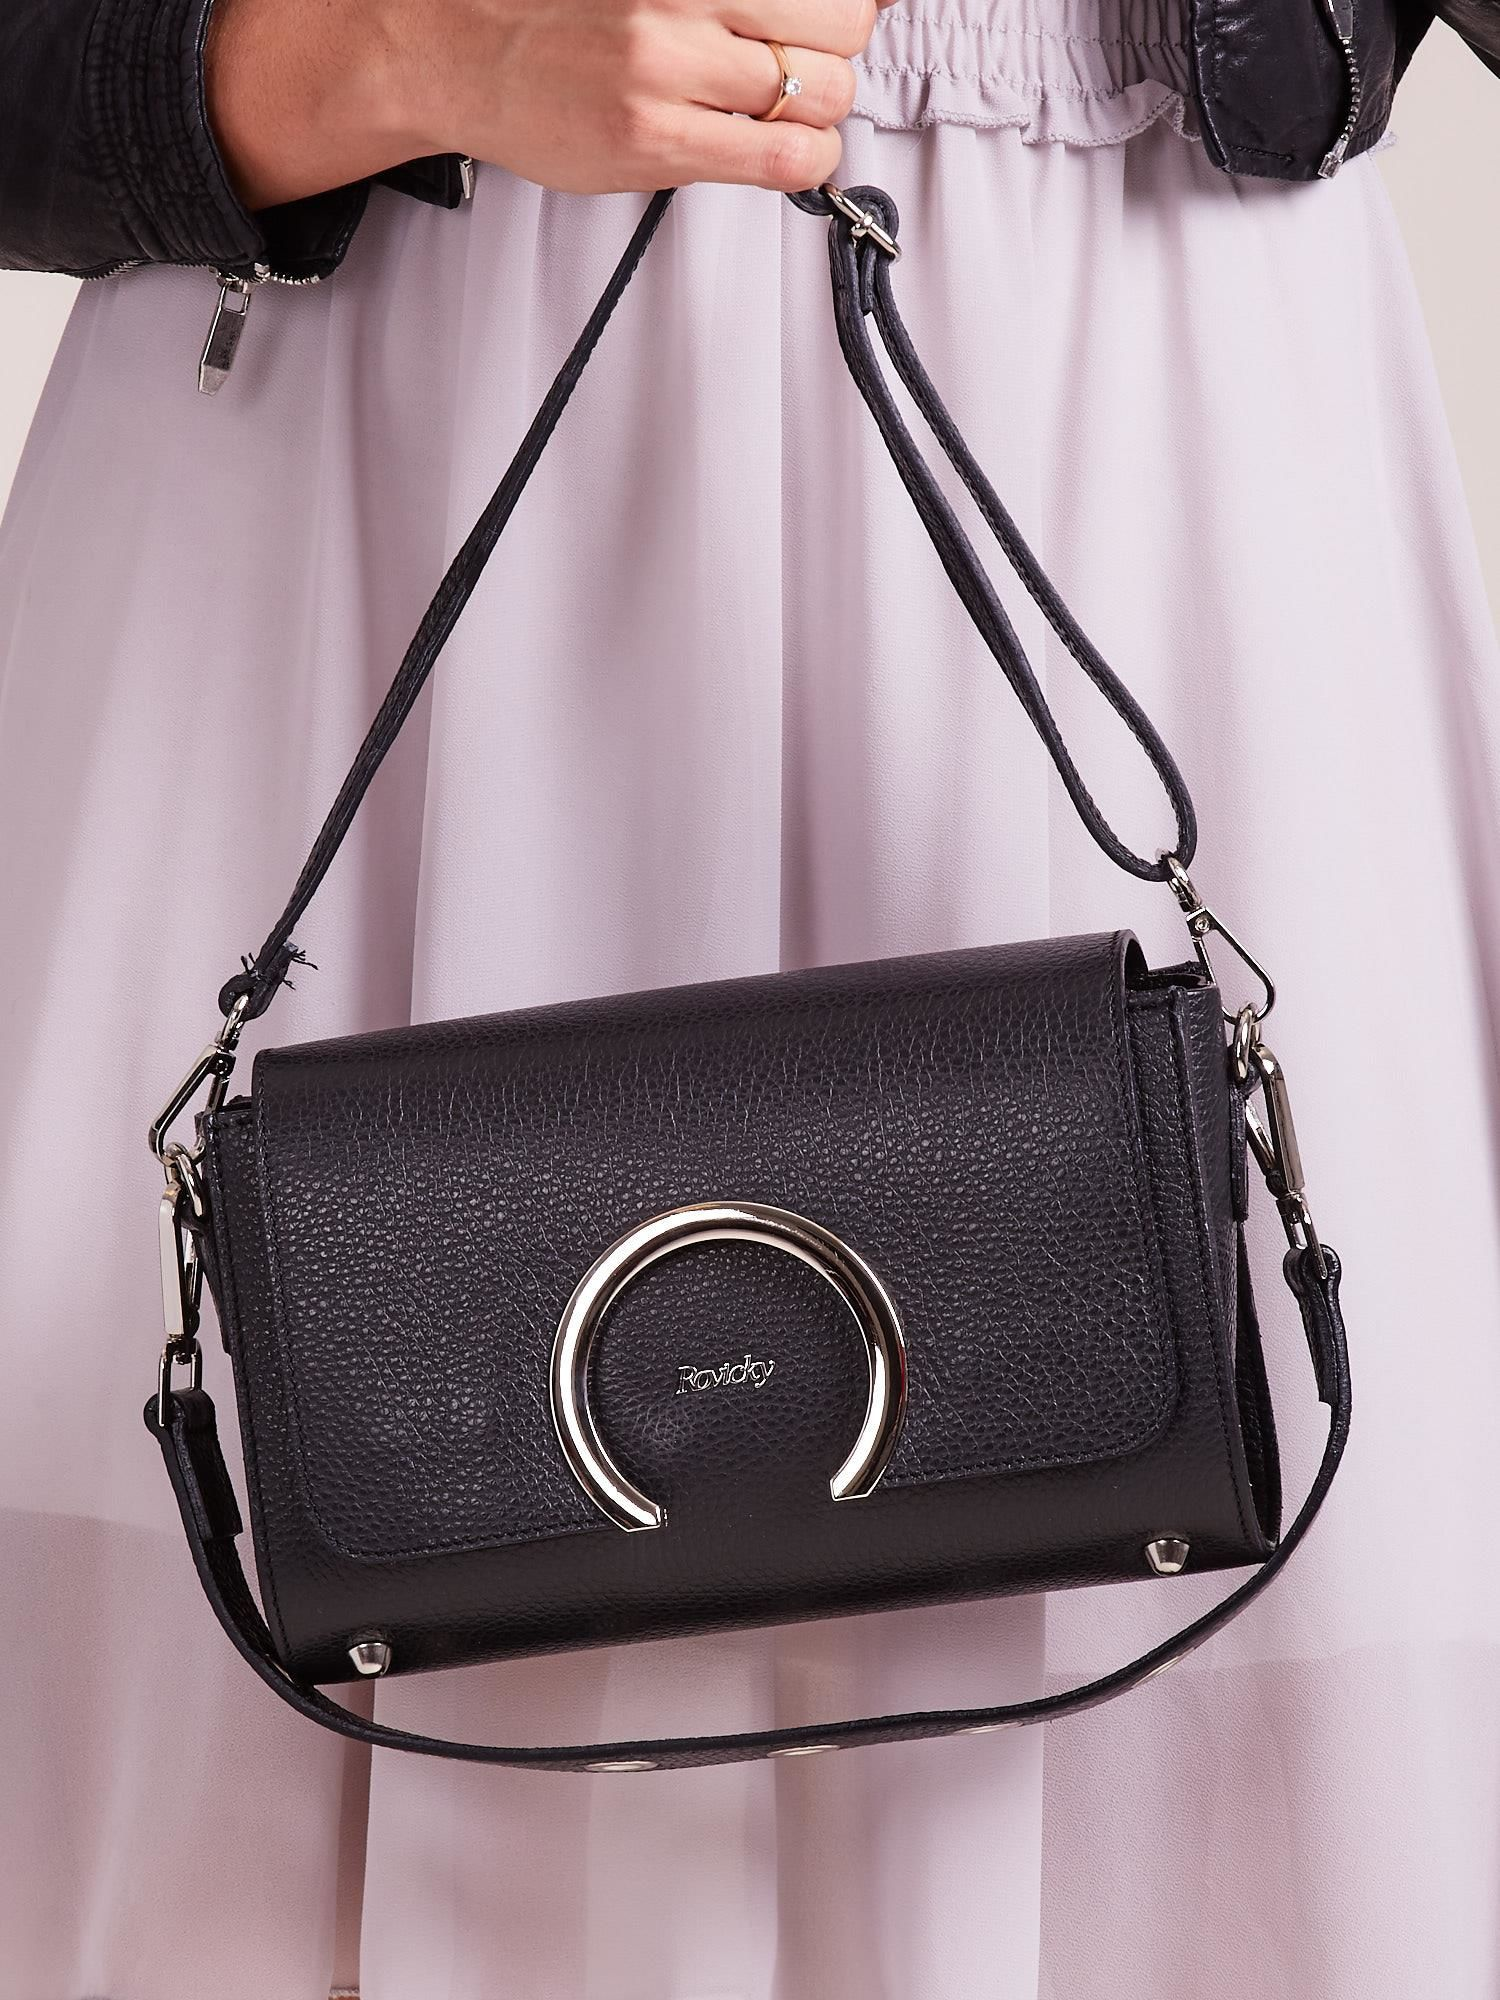 f629b6a62ce96 Czarna elegancka listonoszka ze skóry - Akcesoria torba - sklep ...